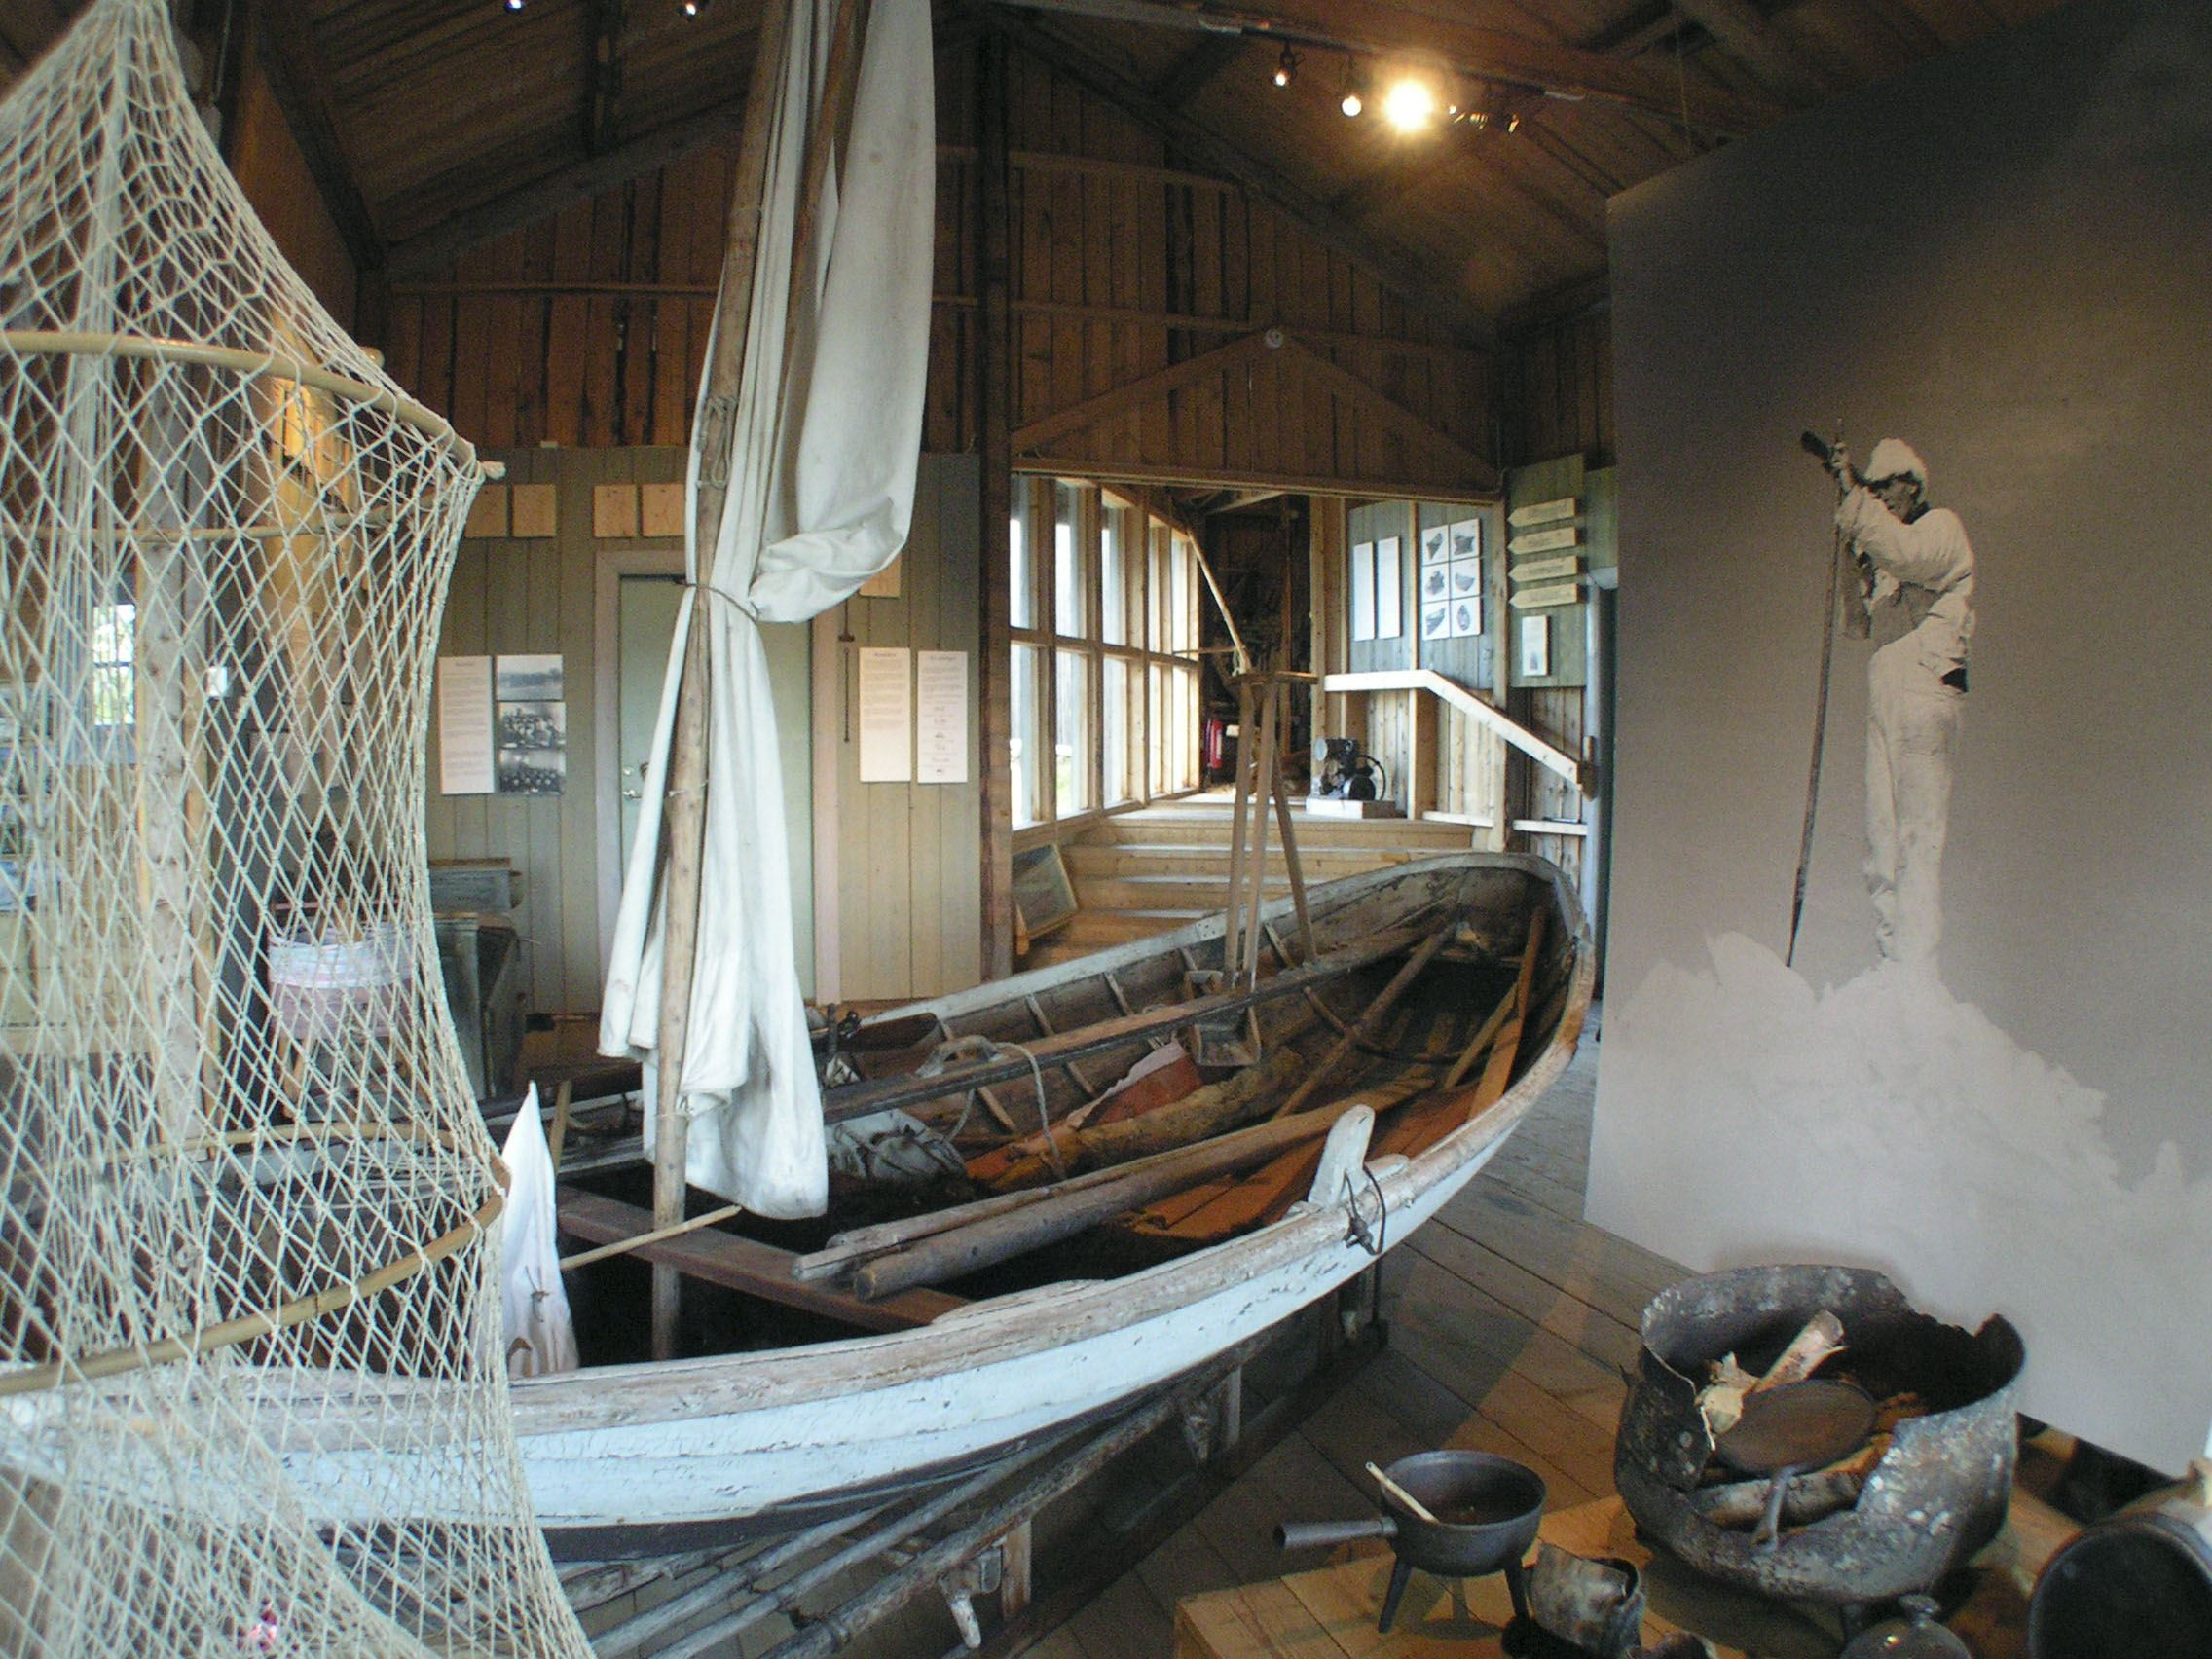 Holmön's boat museum